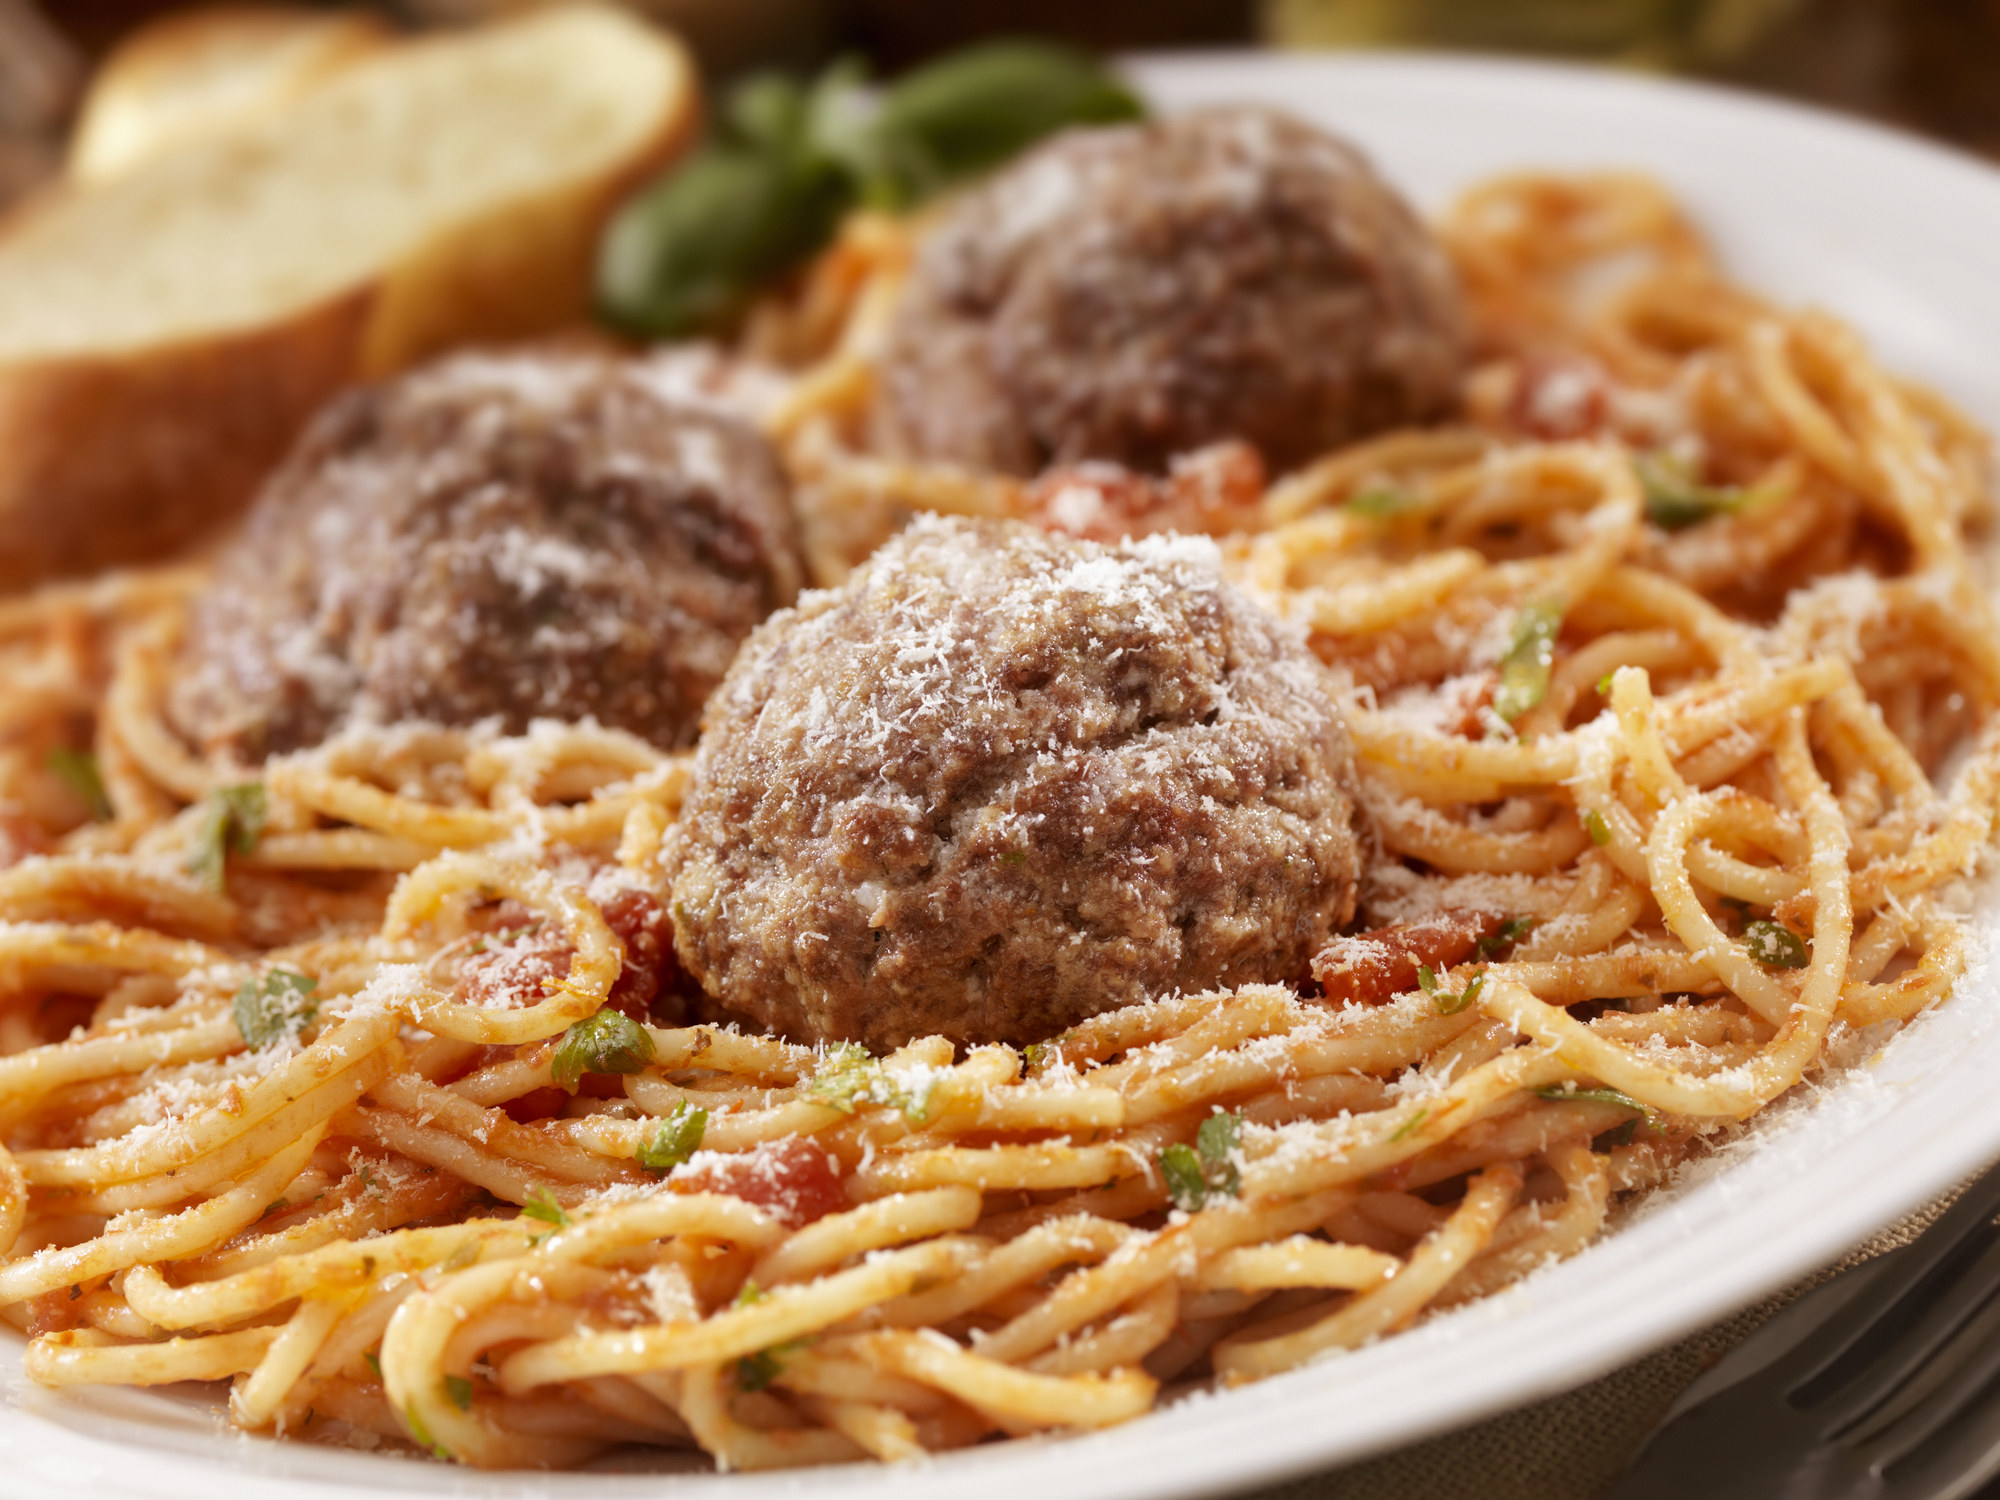 A big plate of spaghetti and meatballs.